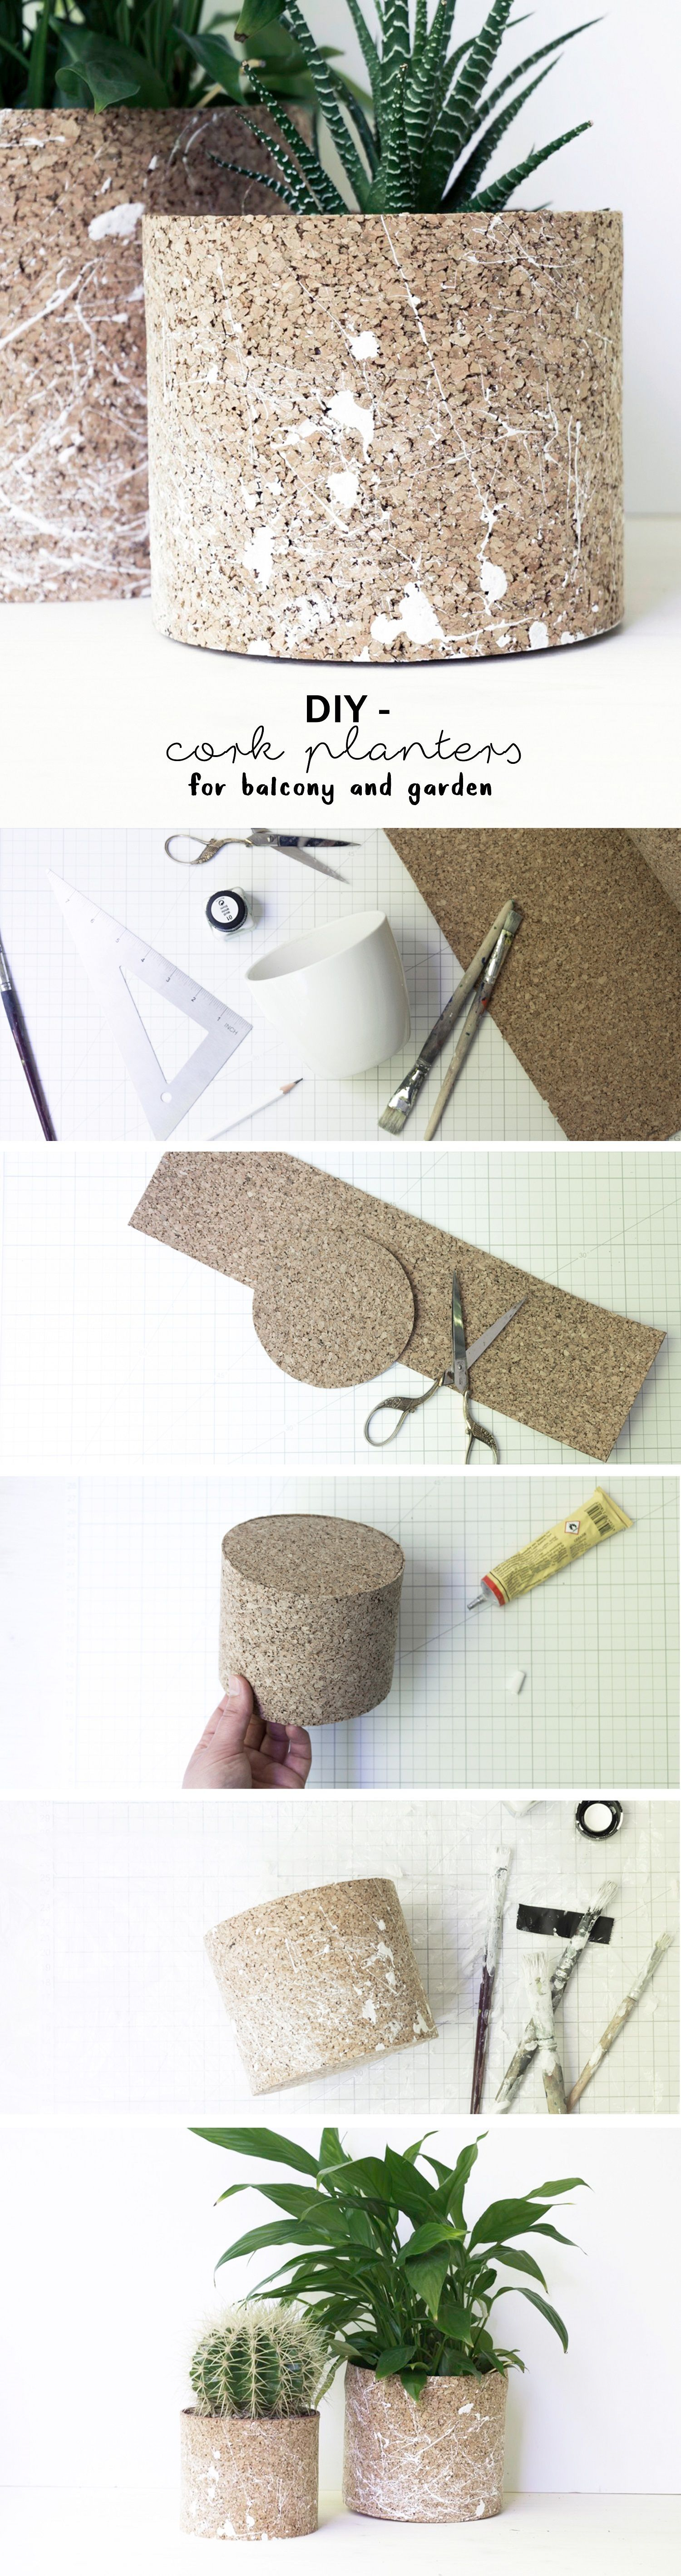 kork pflanzt pfe selber machen balkondeko gartenideen pinterest. Black Bedroom Furniture Sets. Home Design Ideas